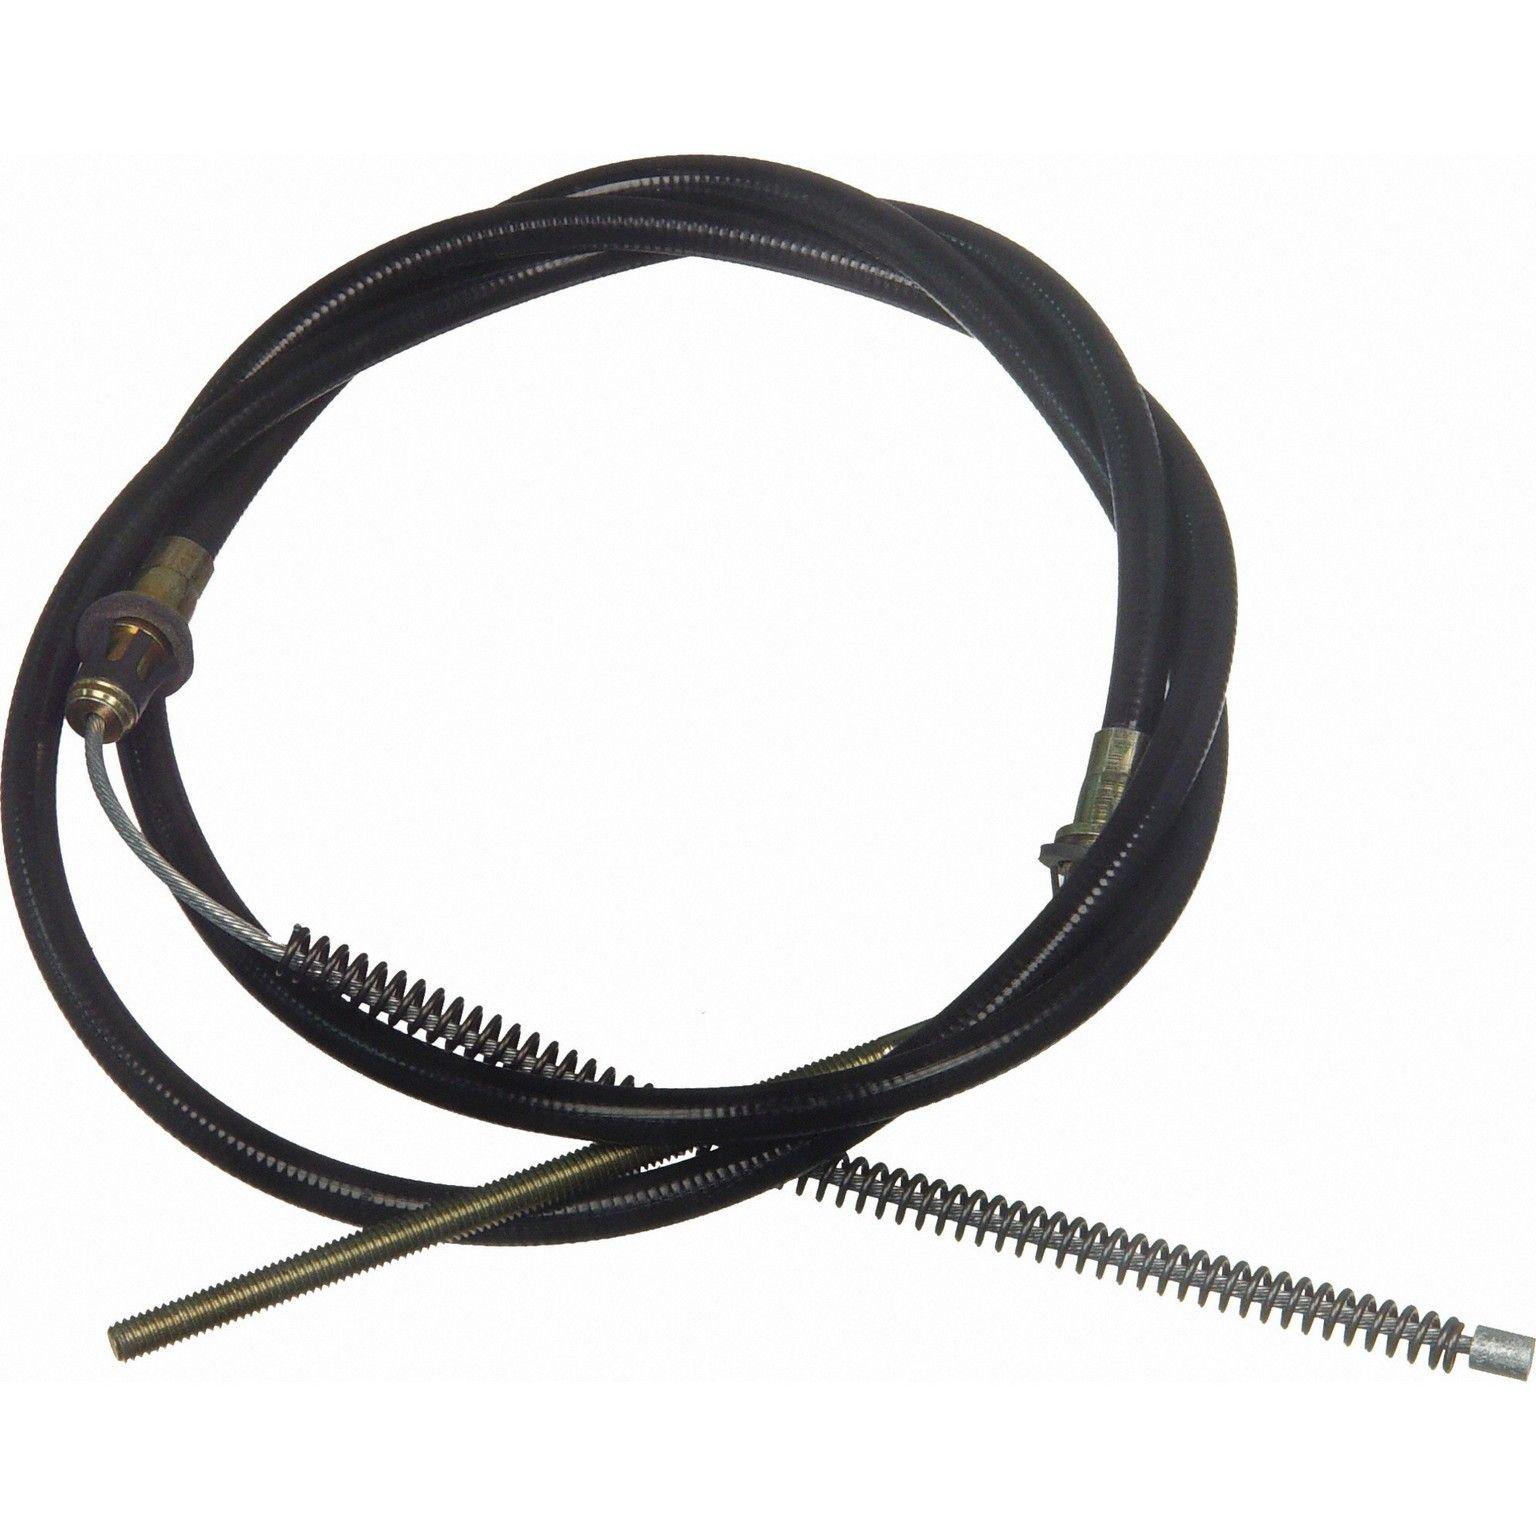 Chevrolet P30 Parking Brake Cable Replacement (Dorman